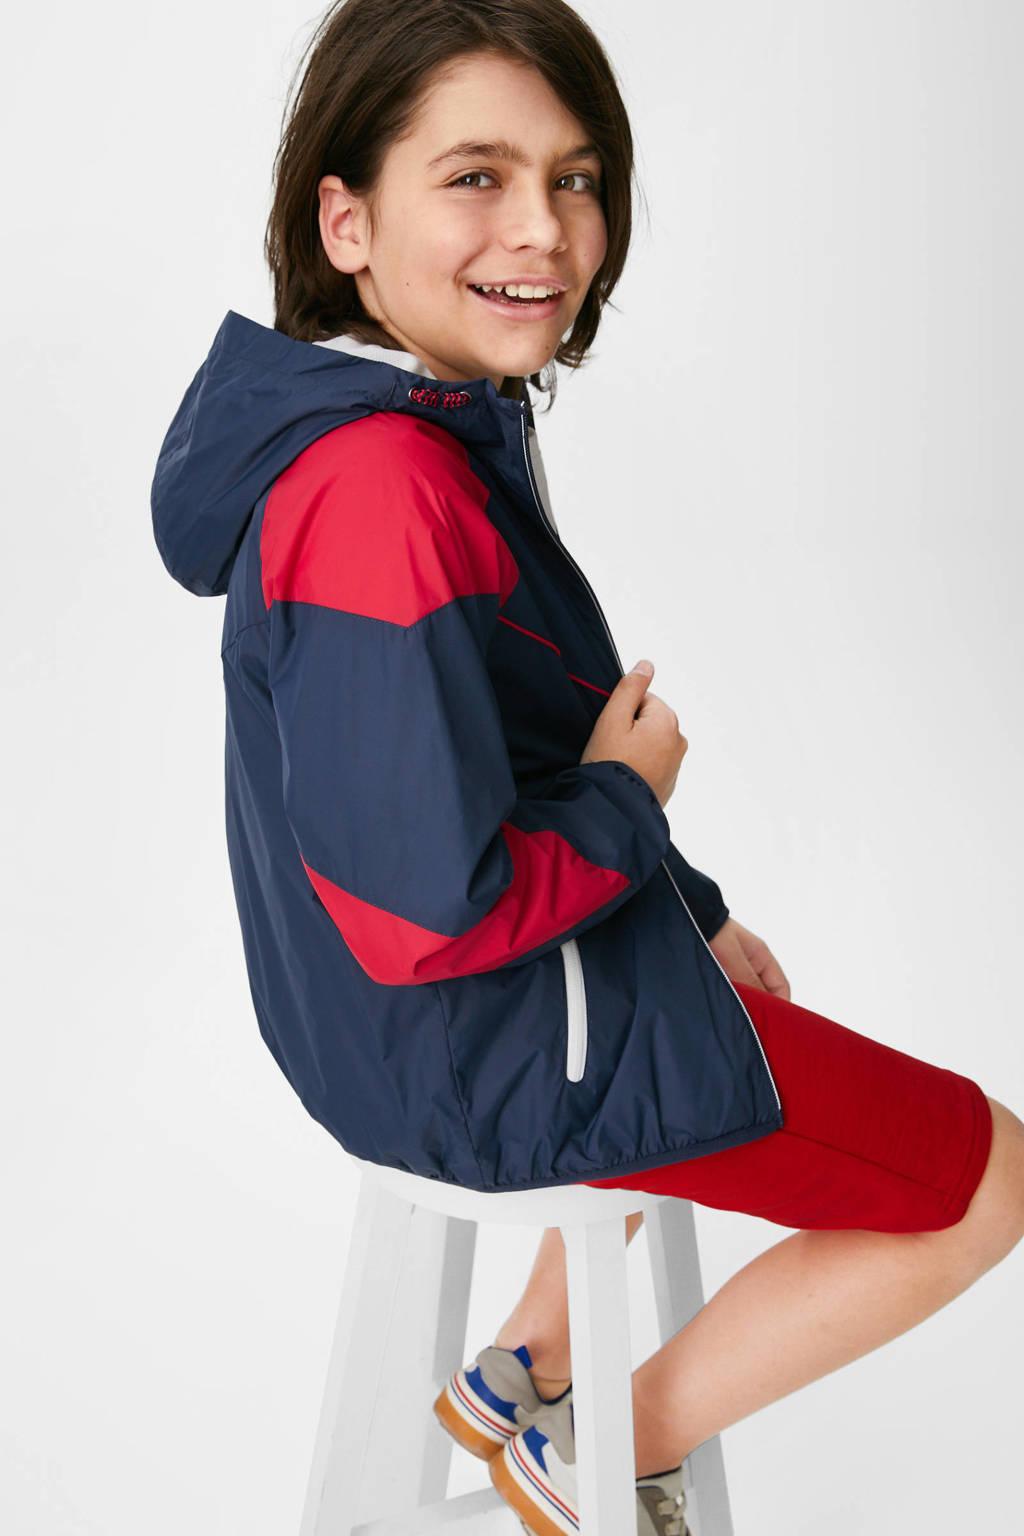 C&A Here & There  zomerjas met 3D applicatie donkerblauw/wit/rood, Donkerblauw/wit/rood